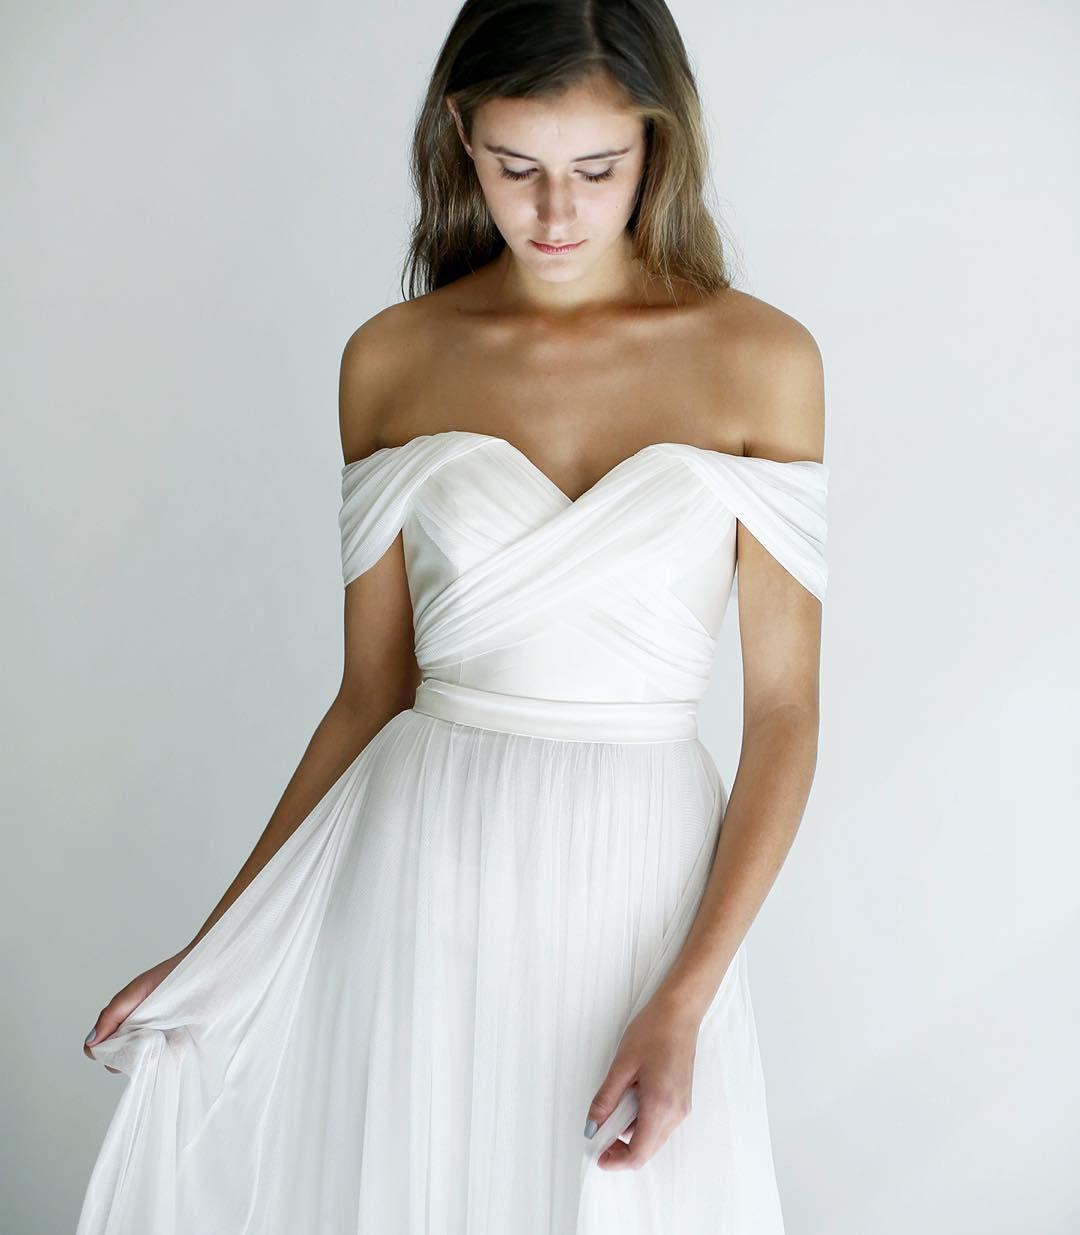 Simple off white wedding dresses   個讚 則留言  Instagram 上的 Leanne Marshall